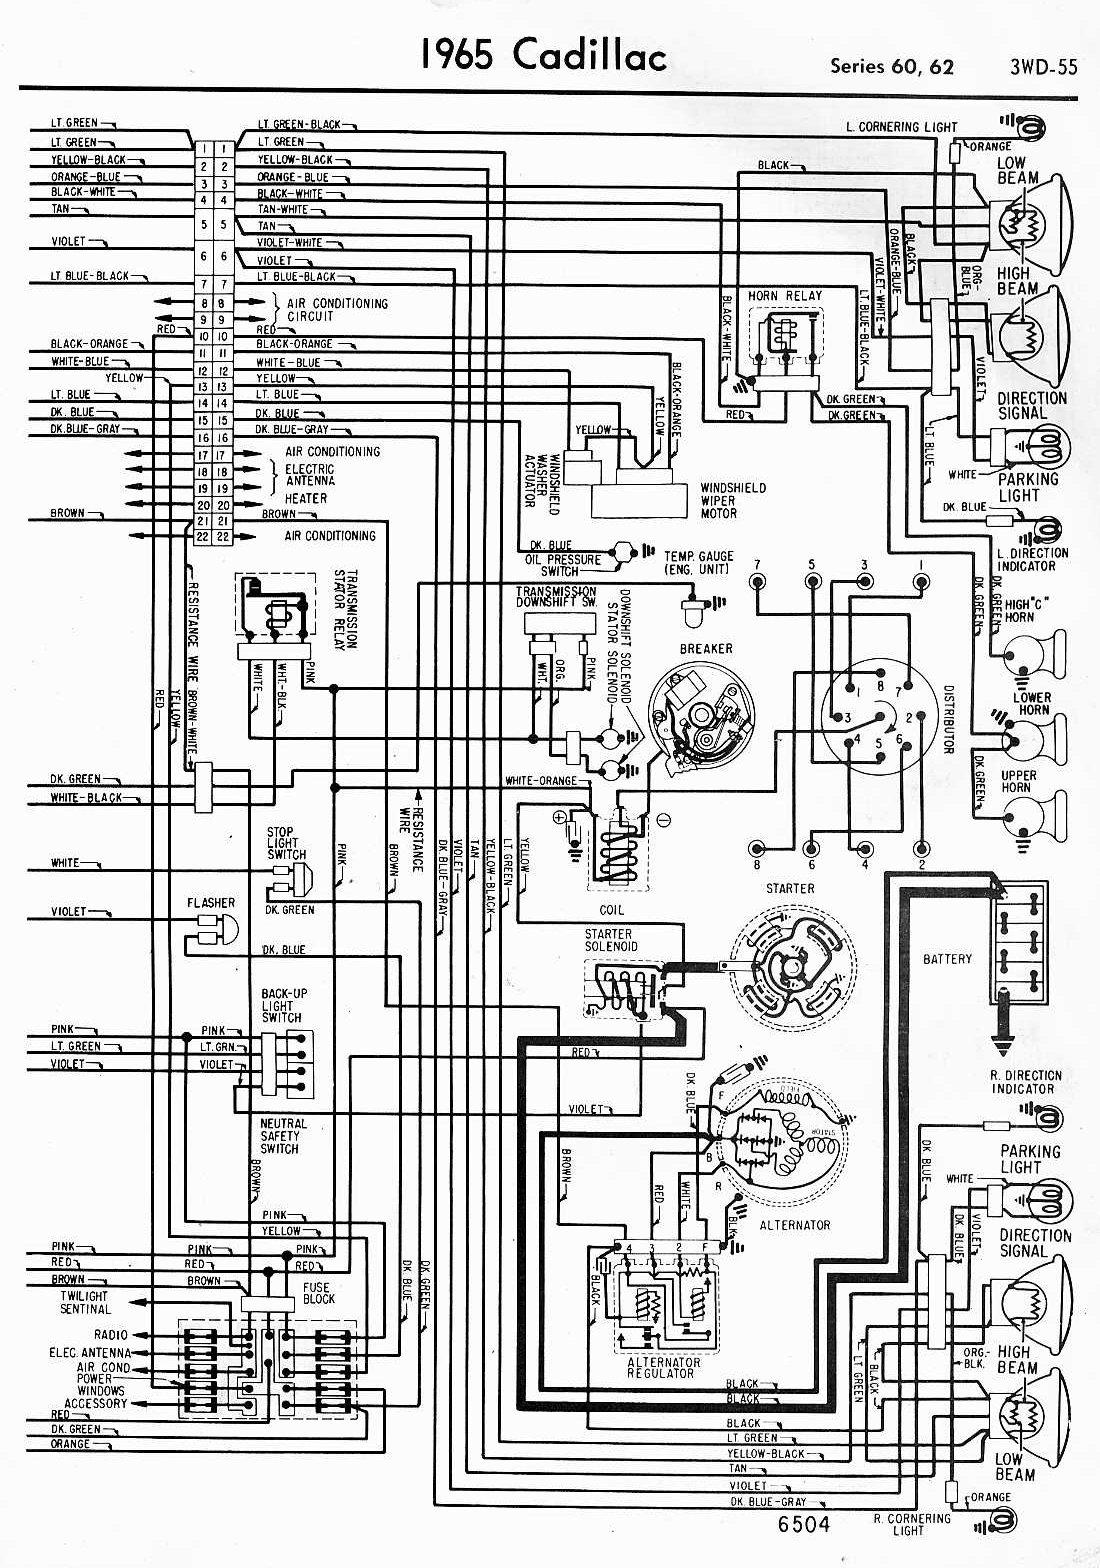 65 Cadillac Wiring Diagram - Wiring Diagram •